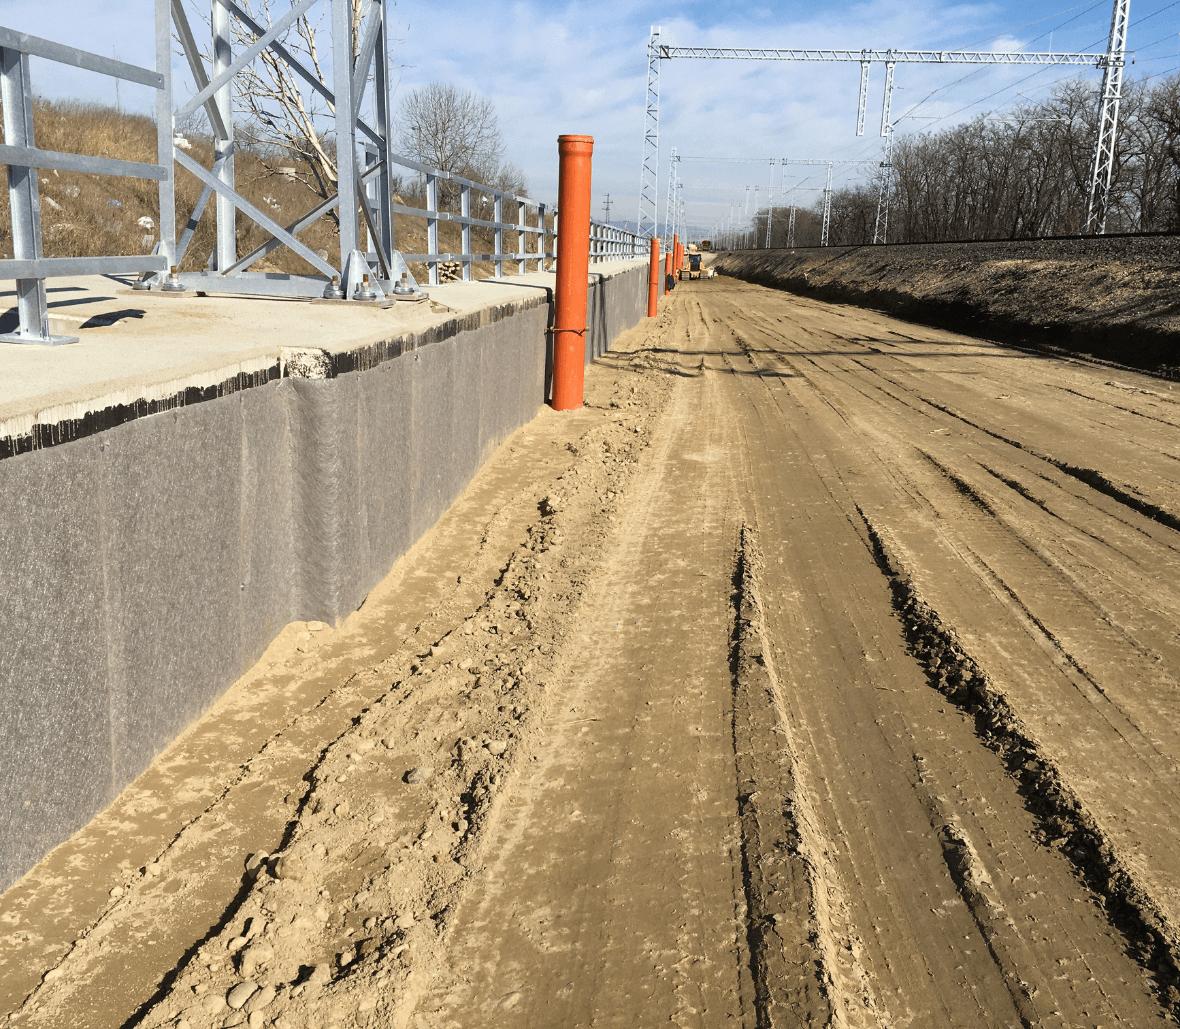 EnkaDrain Structure drainage system installation near train track in France Copyrights Low & Bonar_Enka Solutions